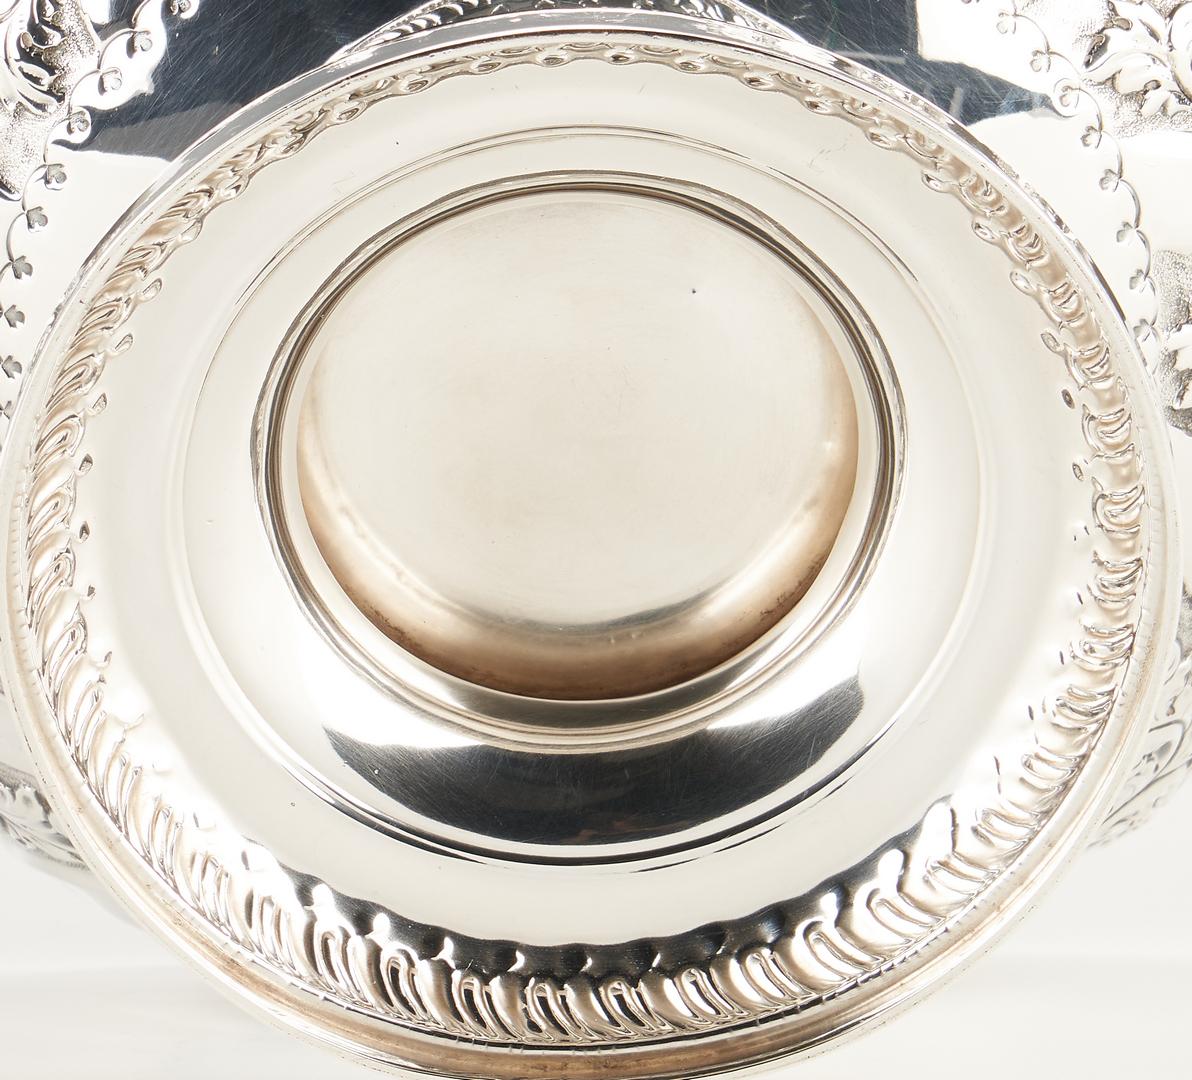 Lot 101: English Victorian Sterling Center Bowl, Banon provenance